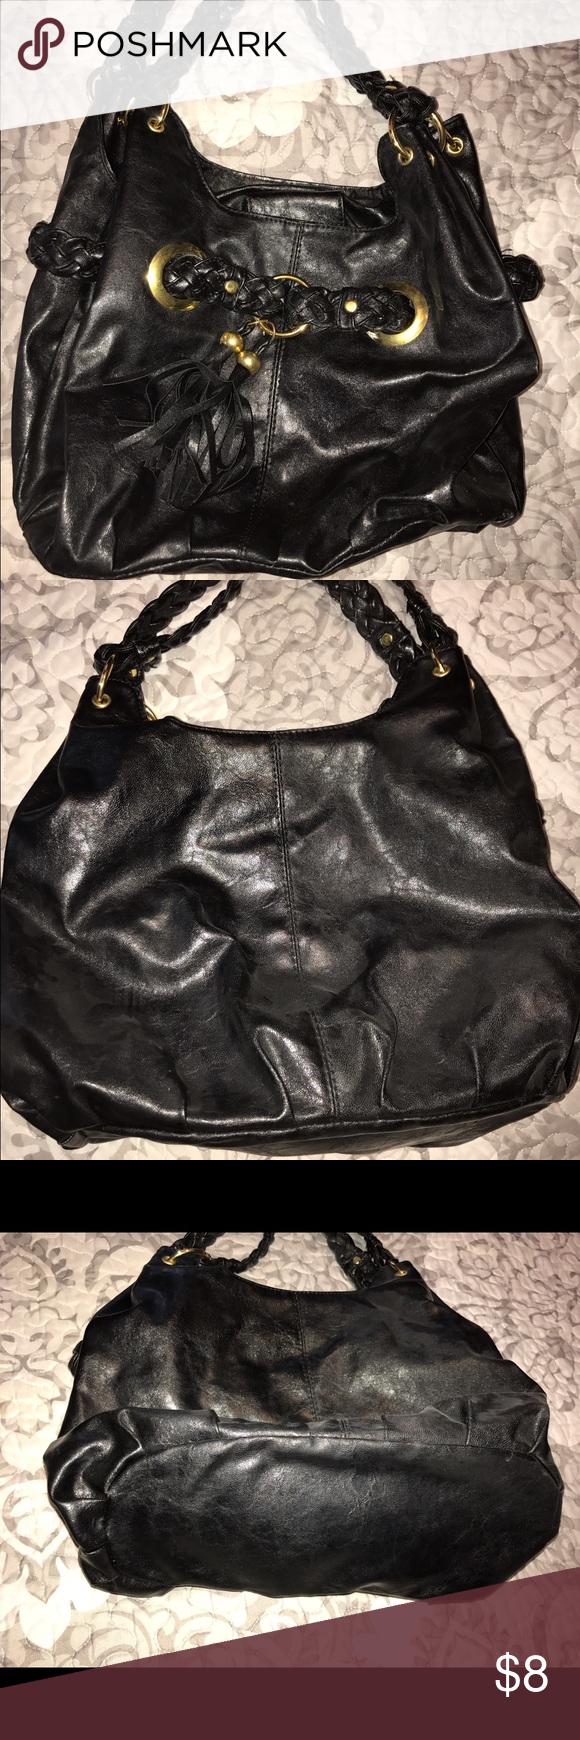 Black bag Black bag, cute tassel in front and braided straps. No name, just adorable bag! Medium size. Bags Shoulder Bags